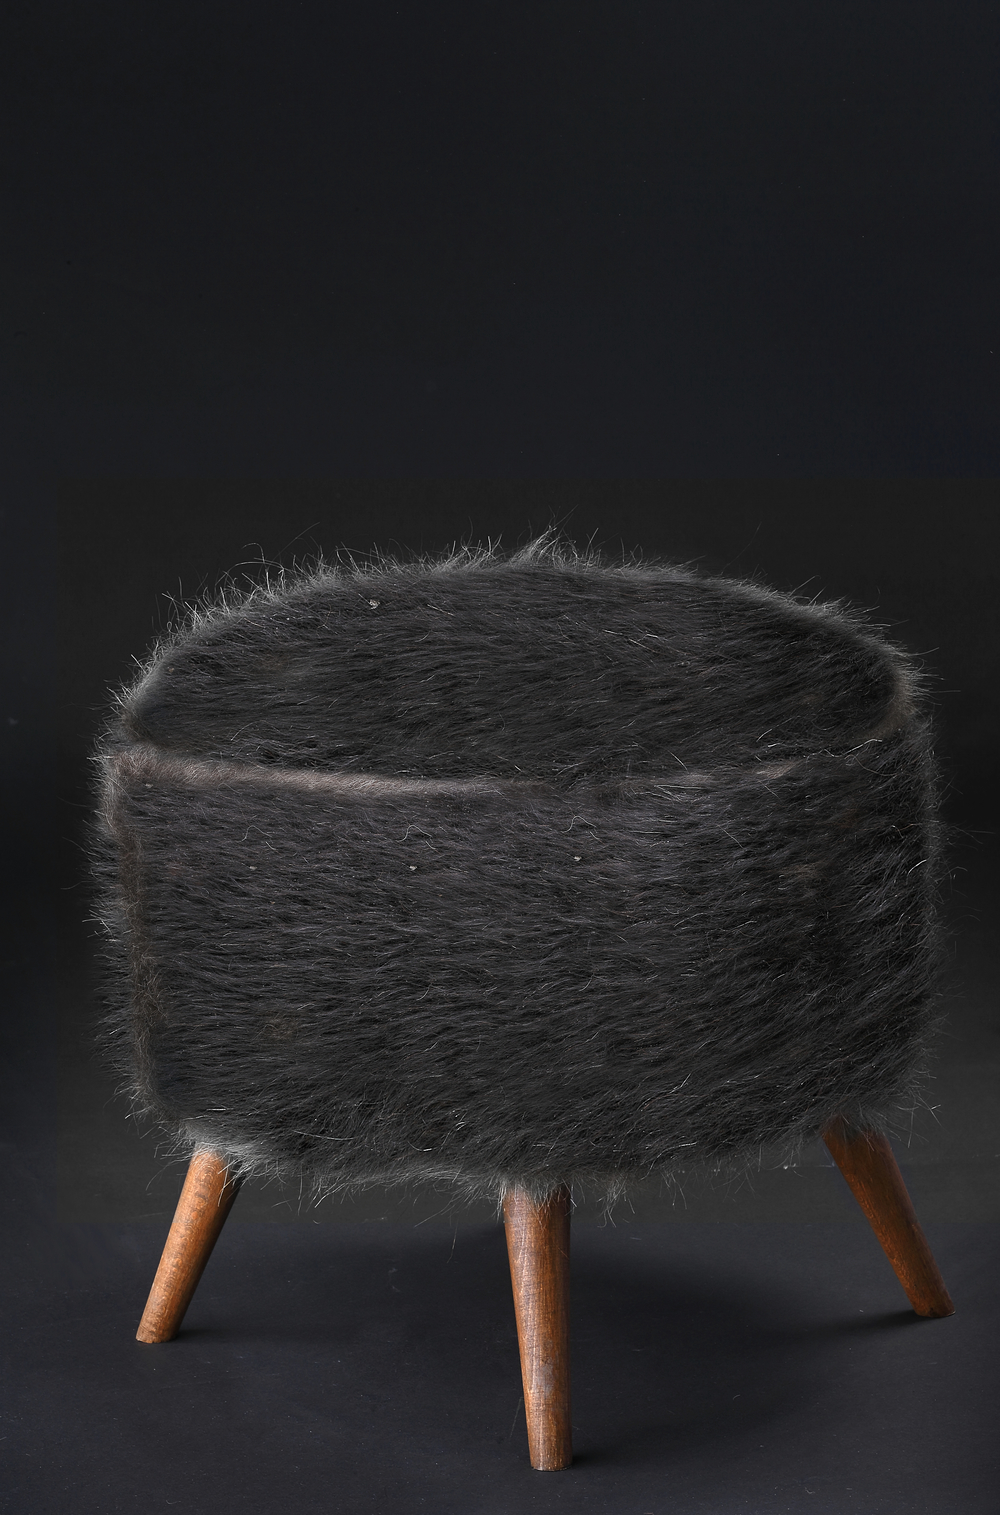 Pouf of Mohair of Angora goat - Black